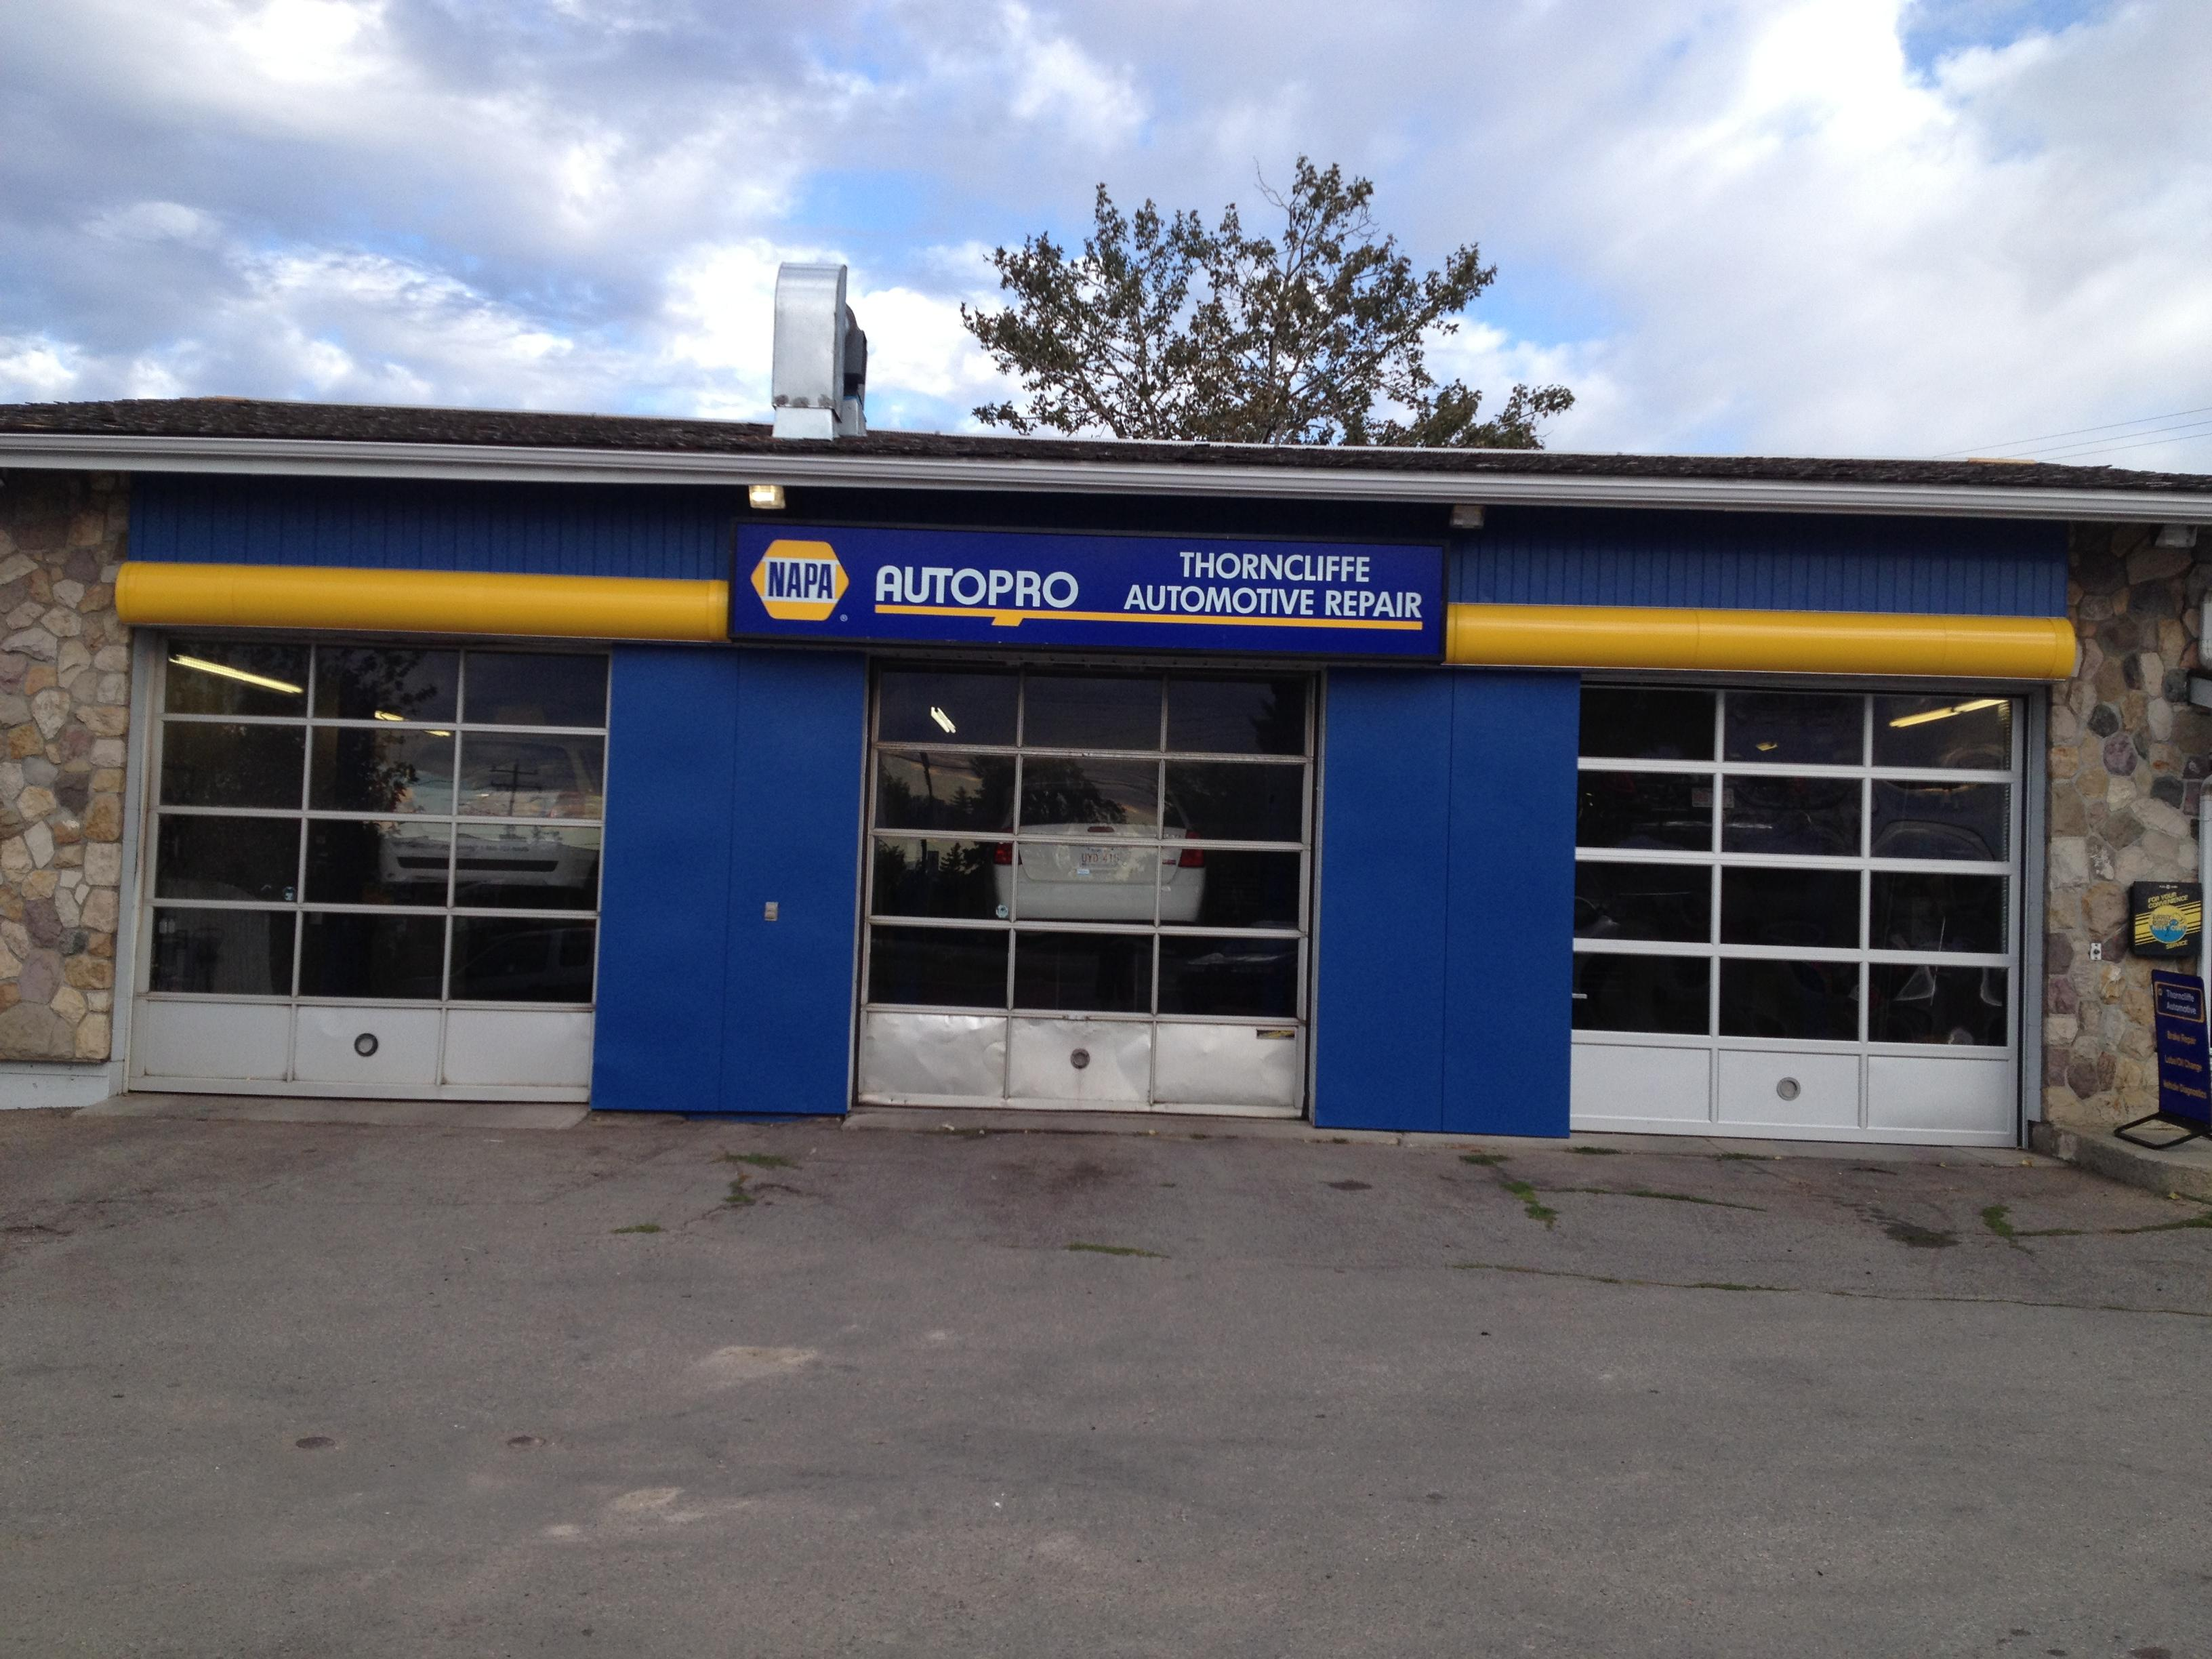 Thorncliffe Automotive Repair